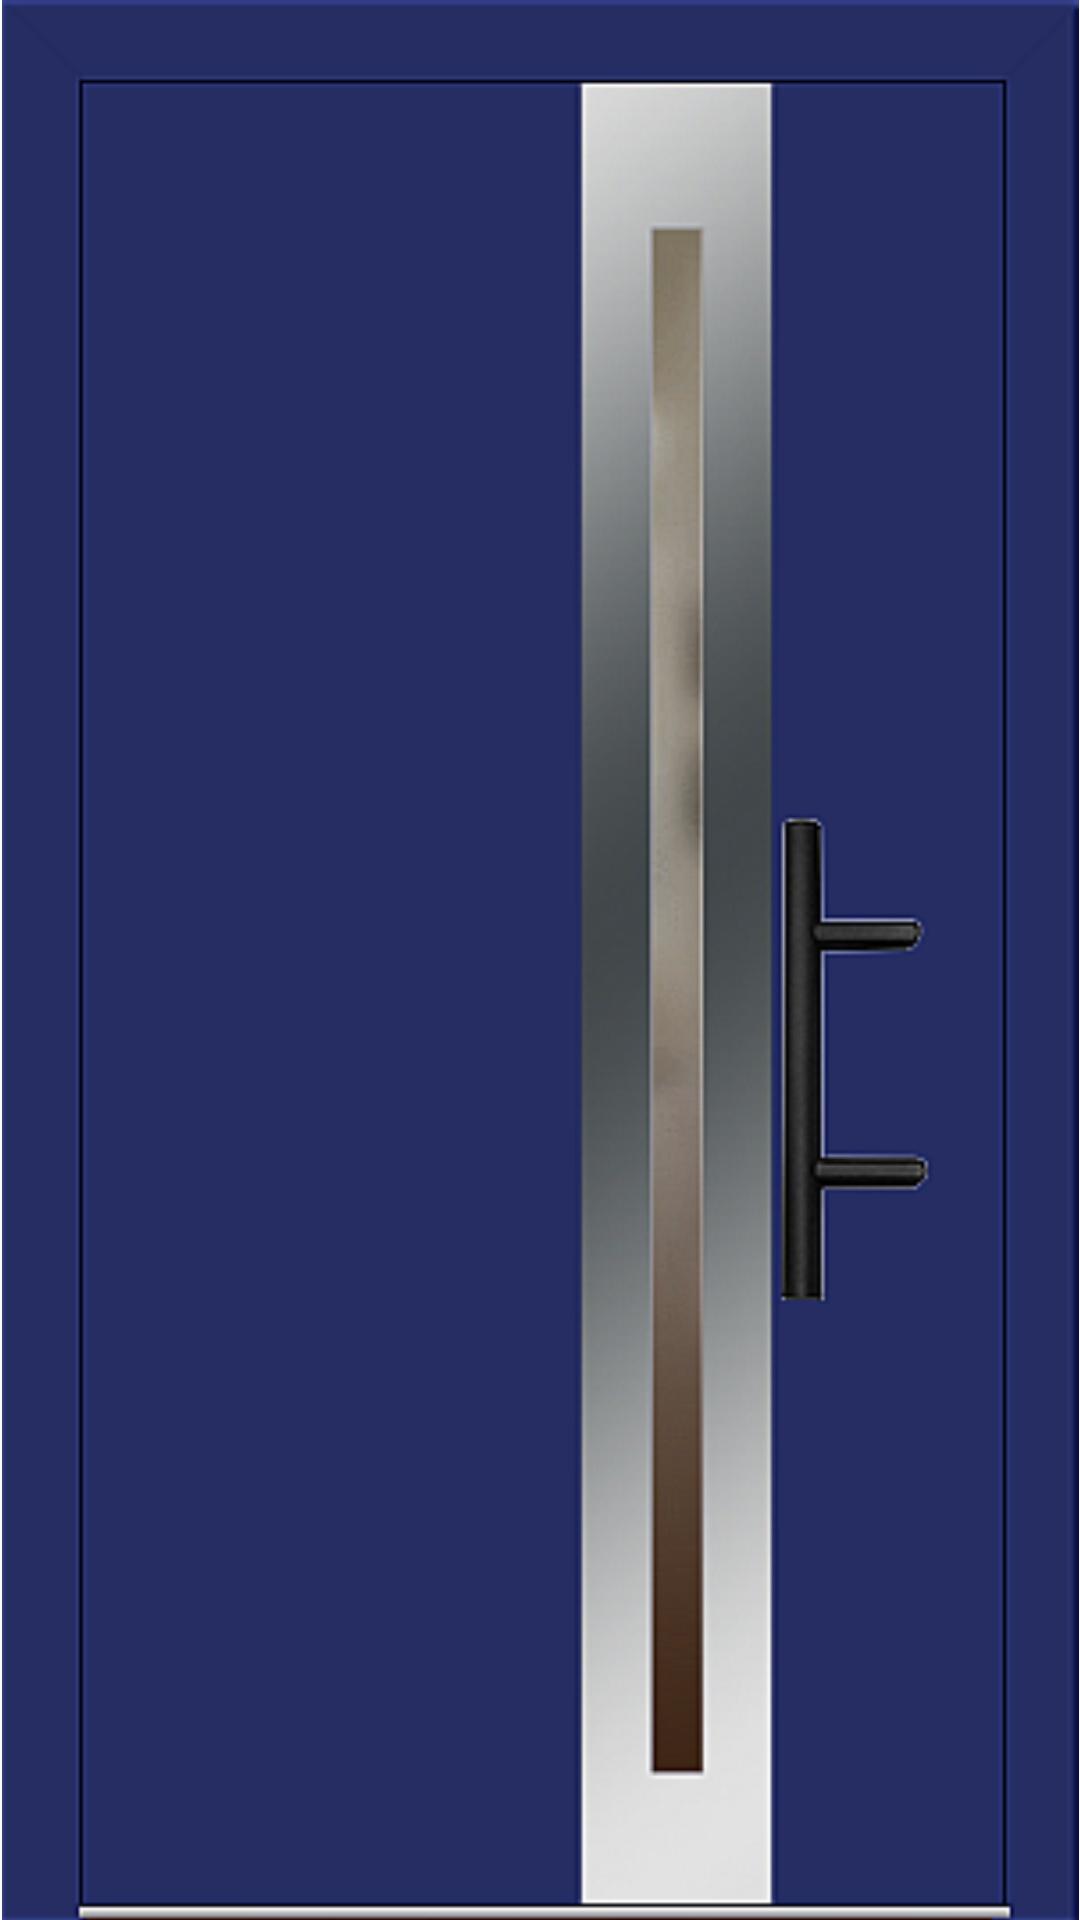 Holz-Alu Haustür Modell 66398 ultramarinblau